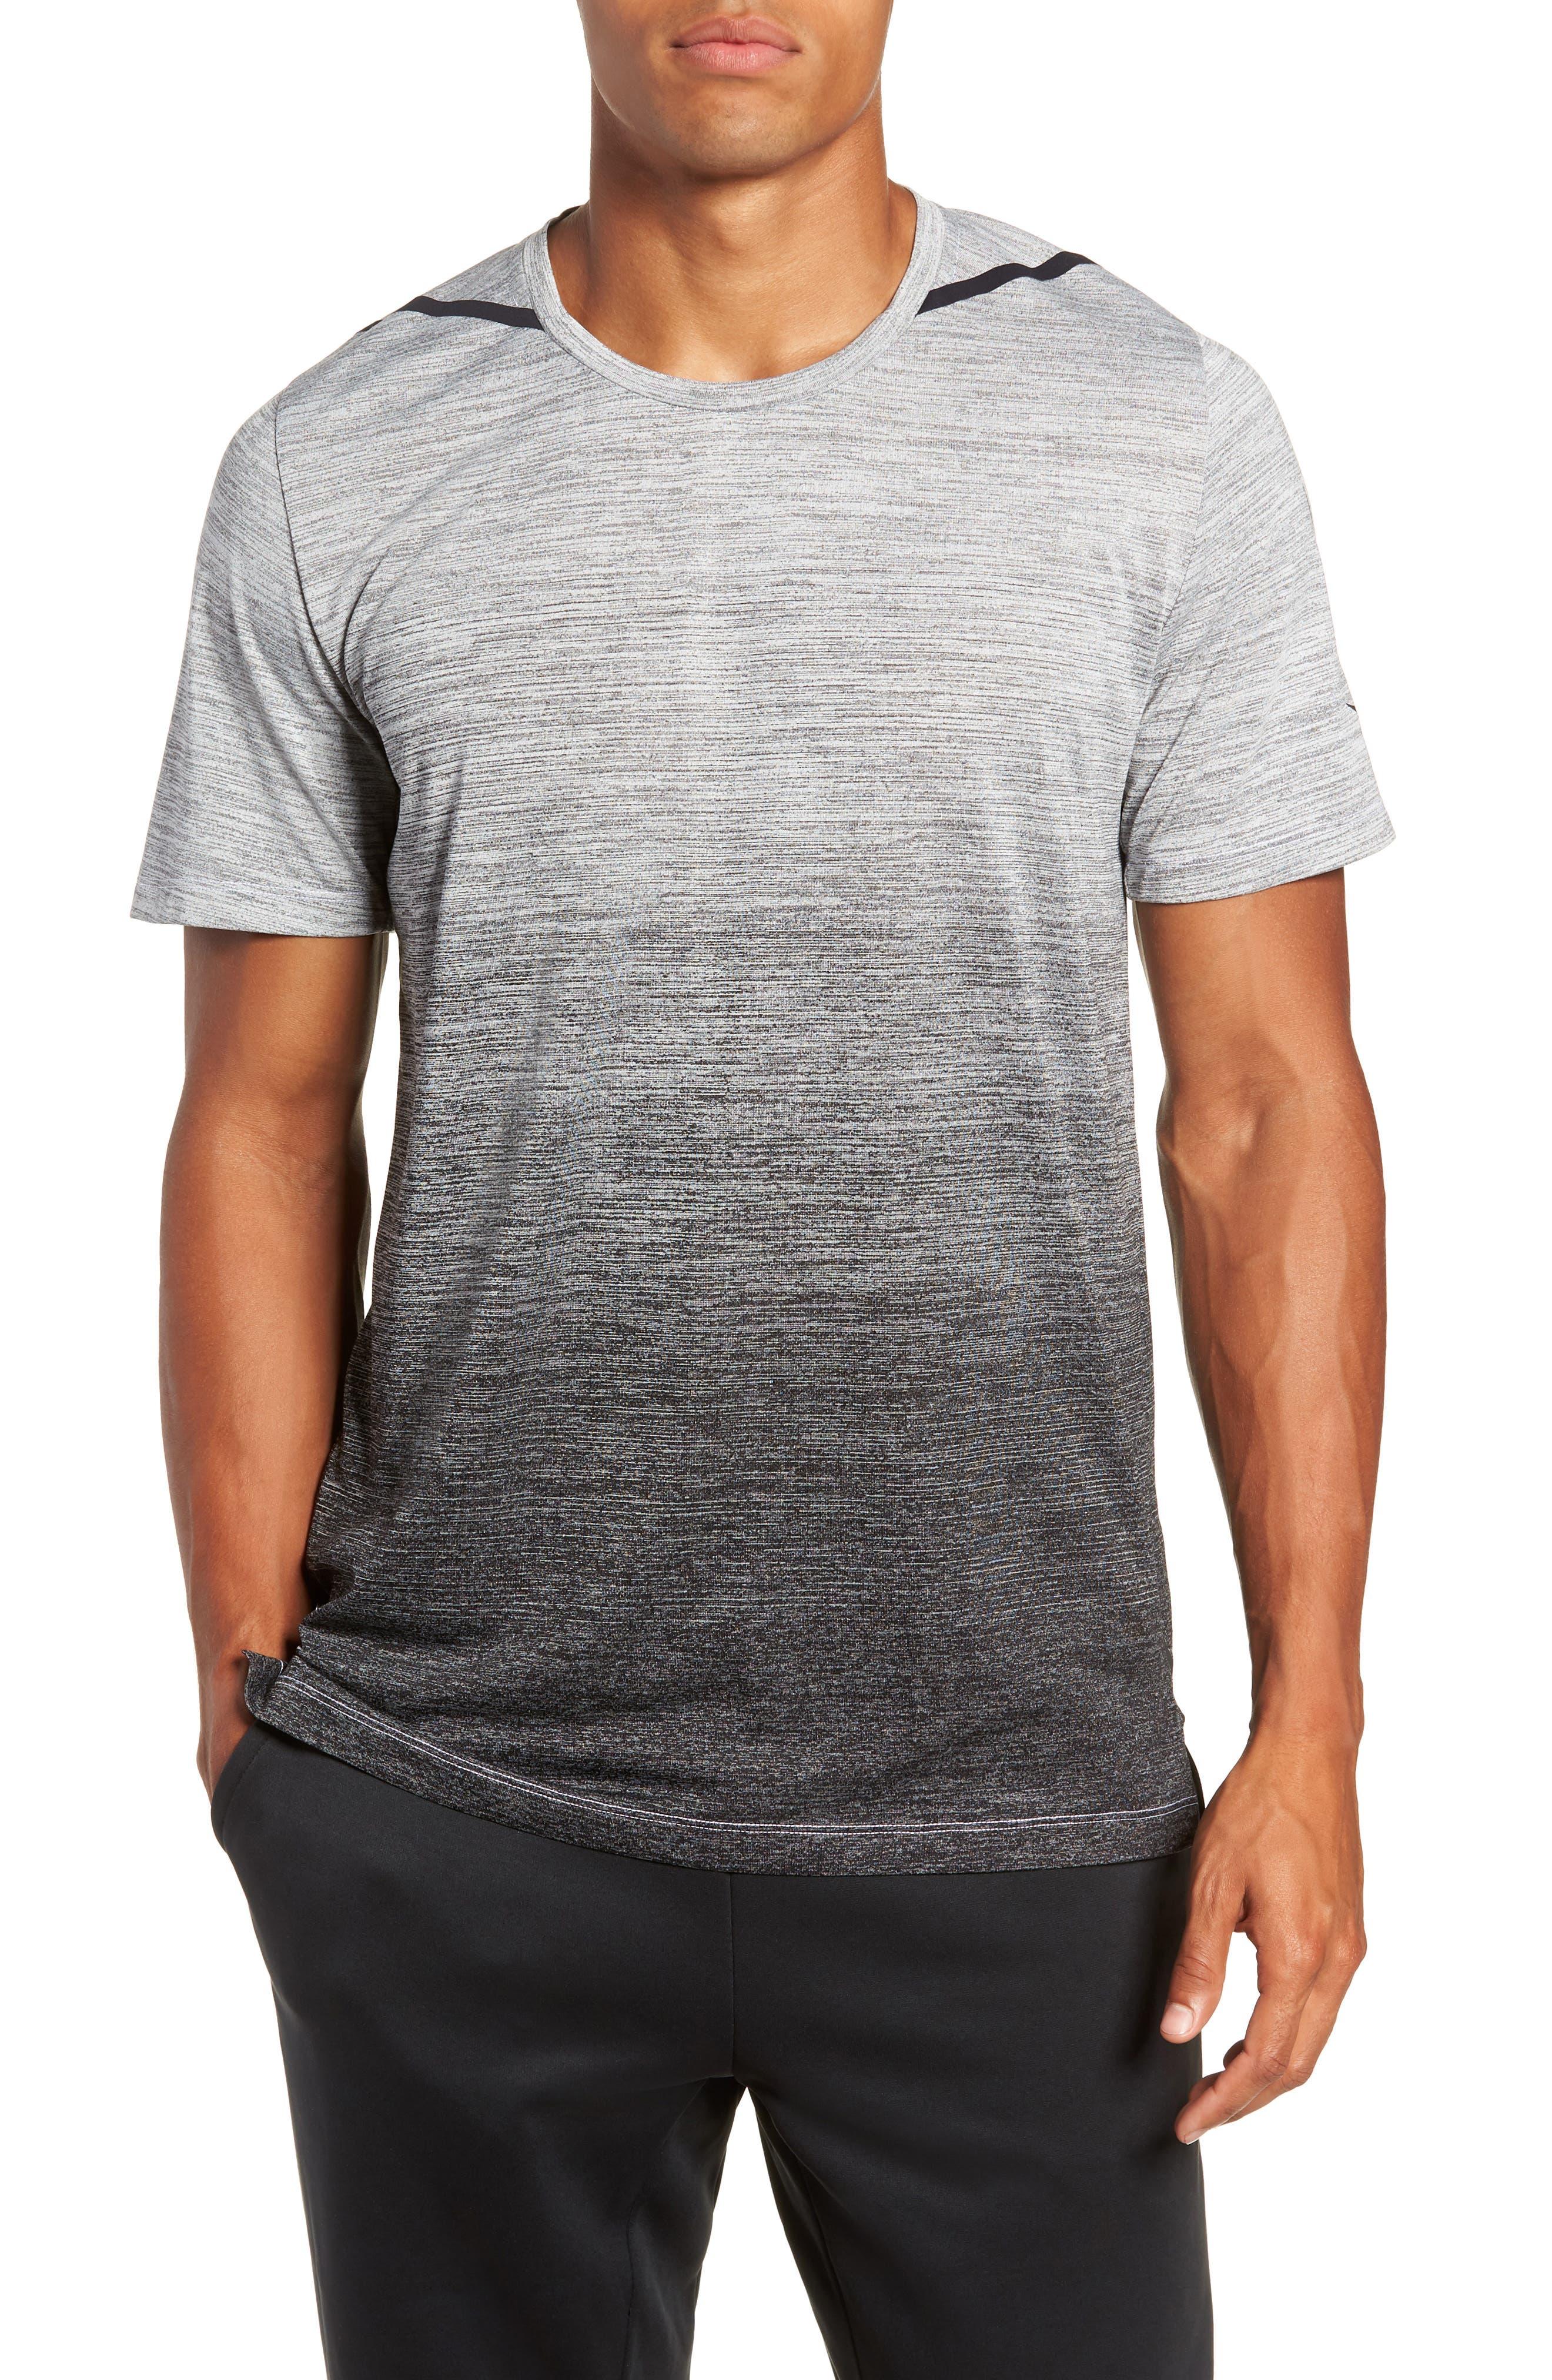 Dry Max Training T-Shirt,                             Main thumbnail 1, color,                             BLACK/ WHITE/ HYPER COBALT